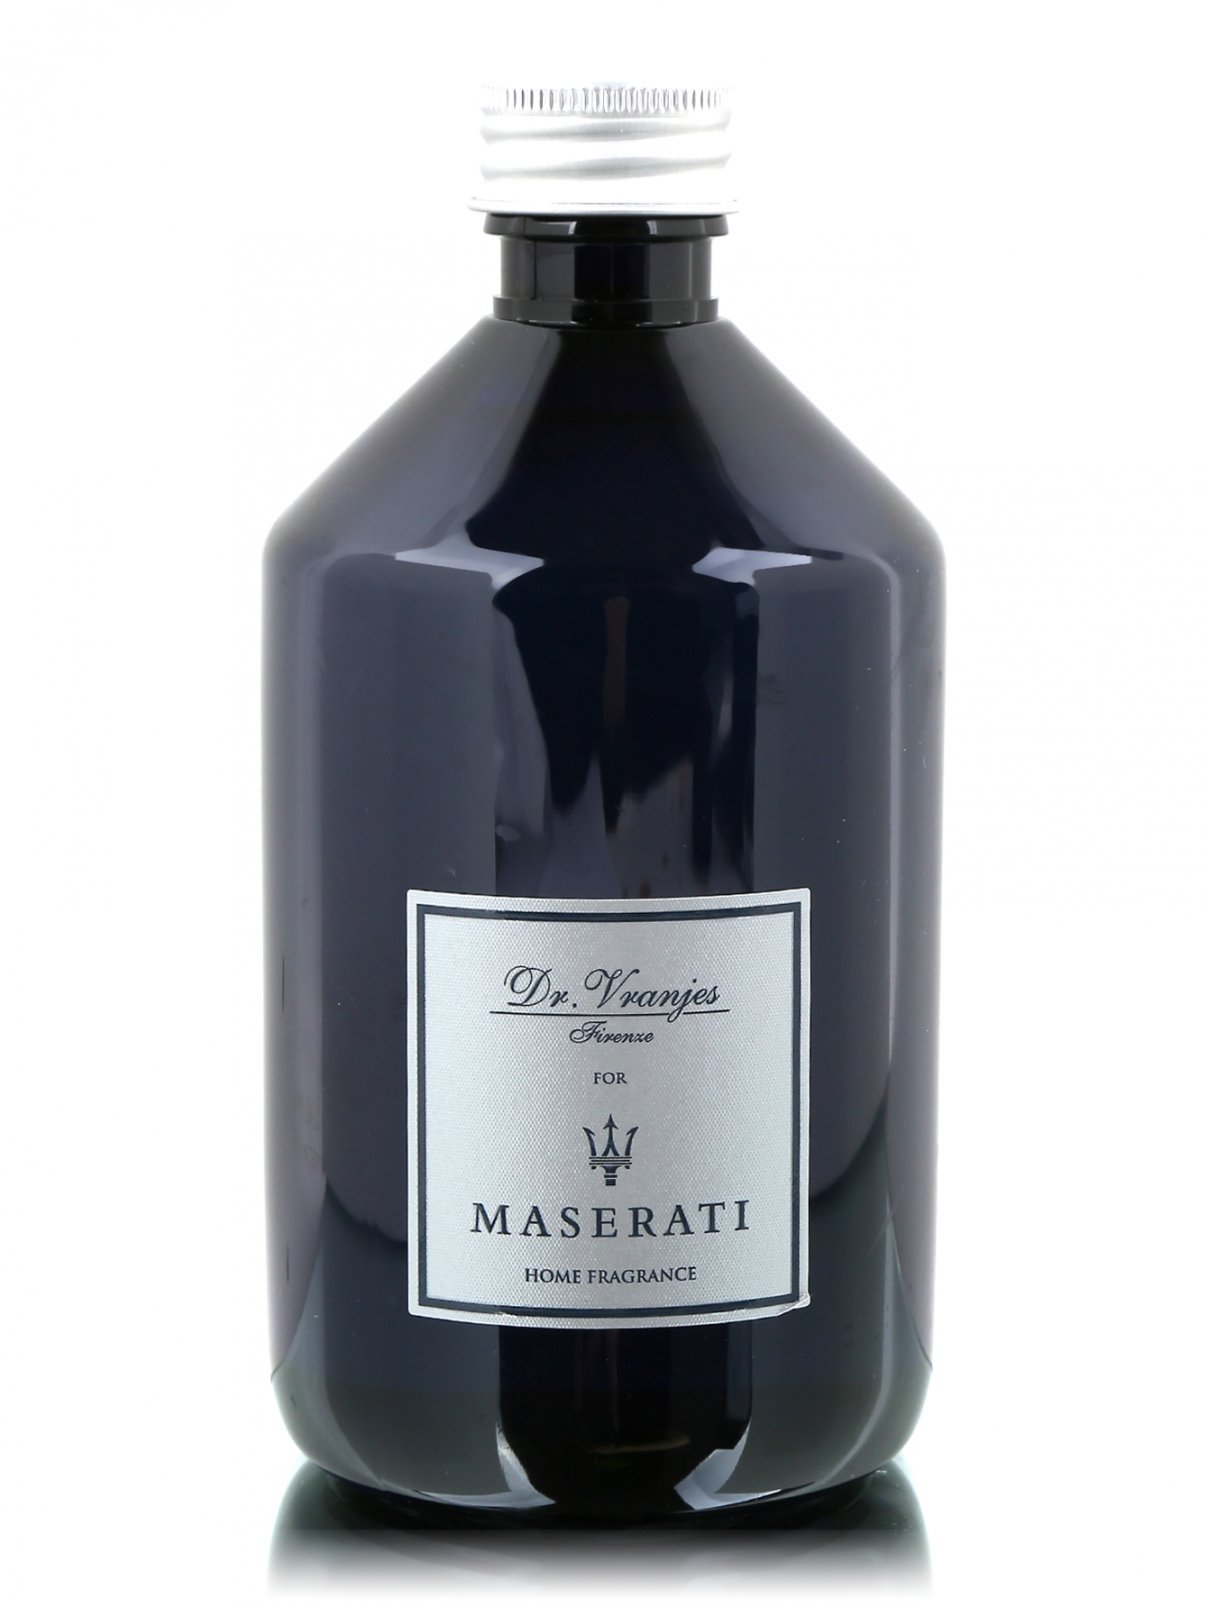 Наполнитель для диффузора Maserati 500 мл Home Fragrance Dr. Vranjes  –  Общий вид